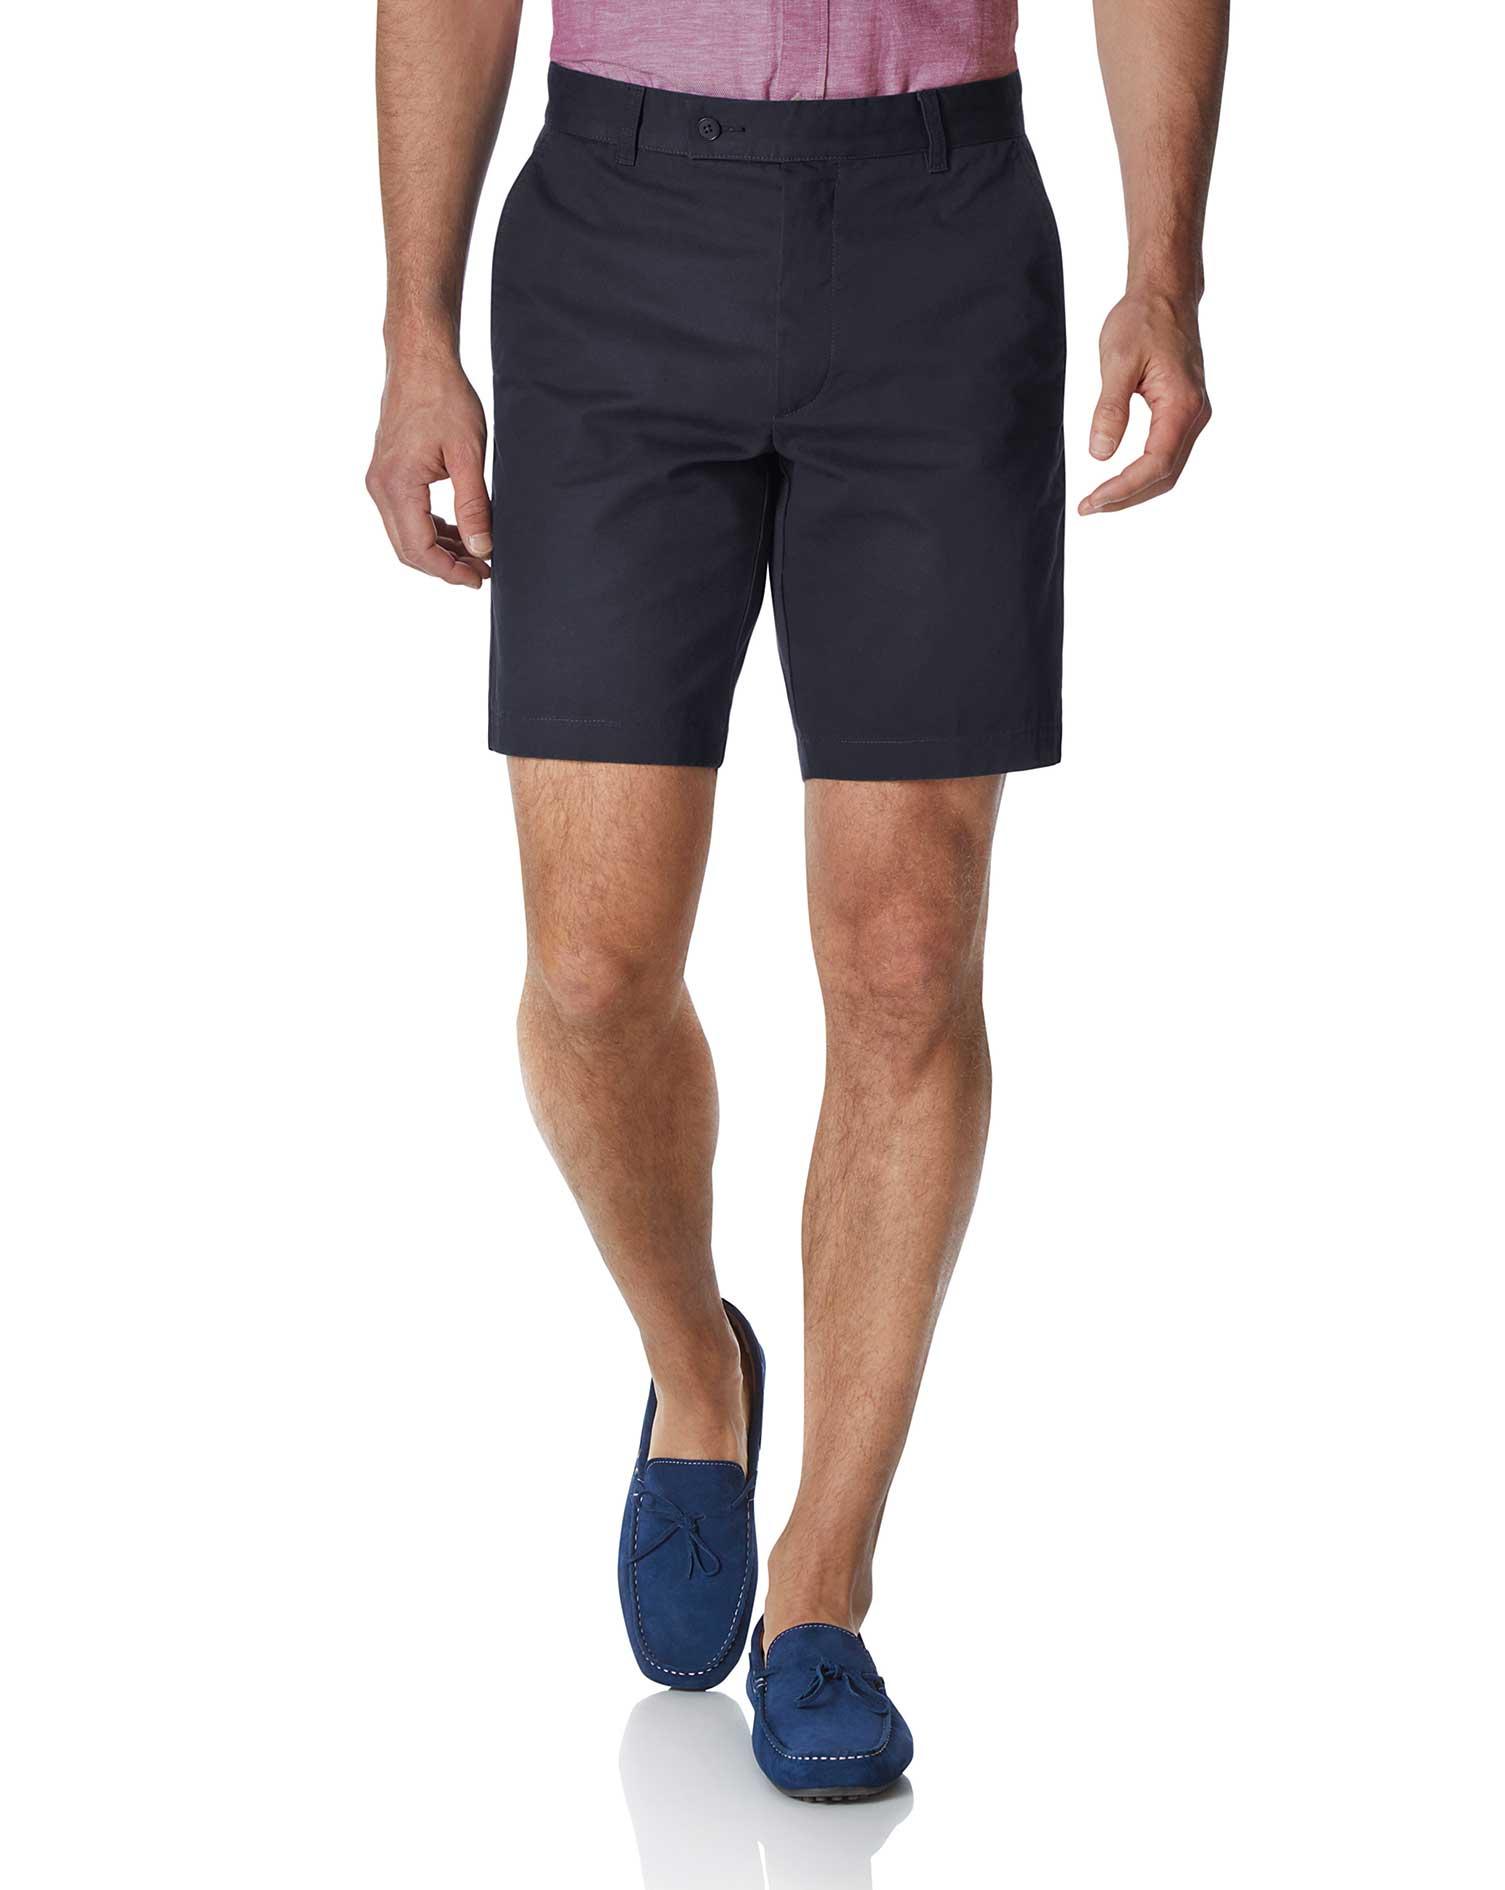 Navy Chino Cotton Shorts Size 36 by Charles Tyrwhitt